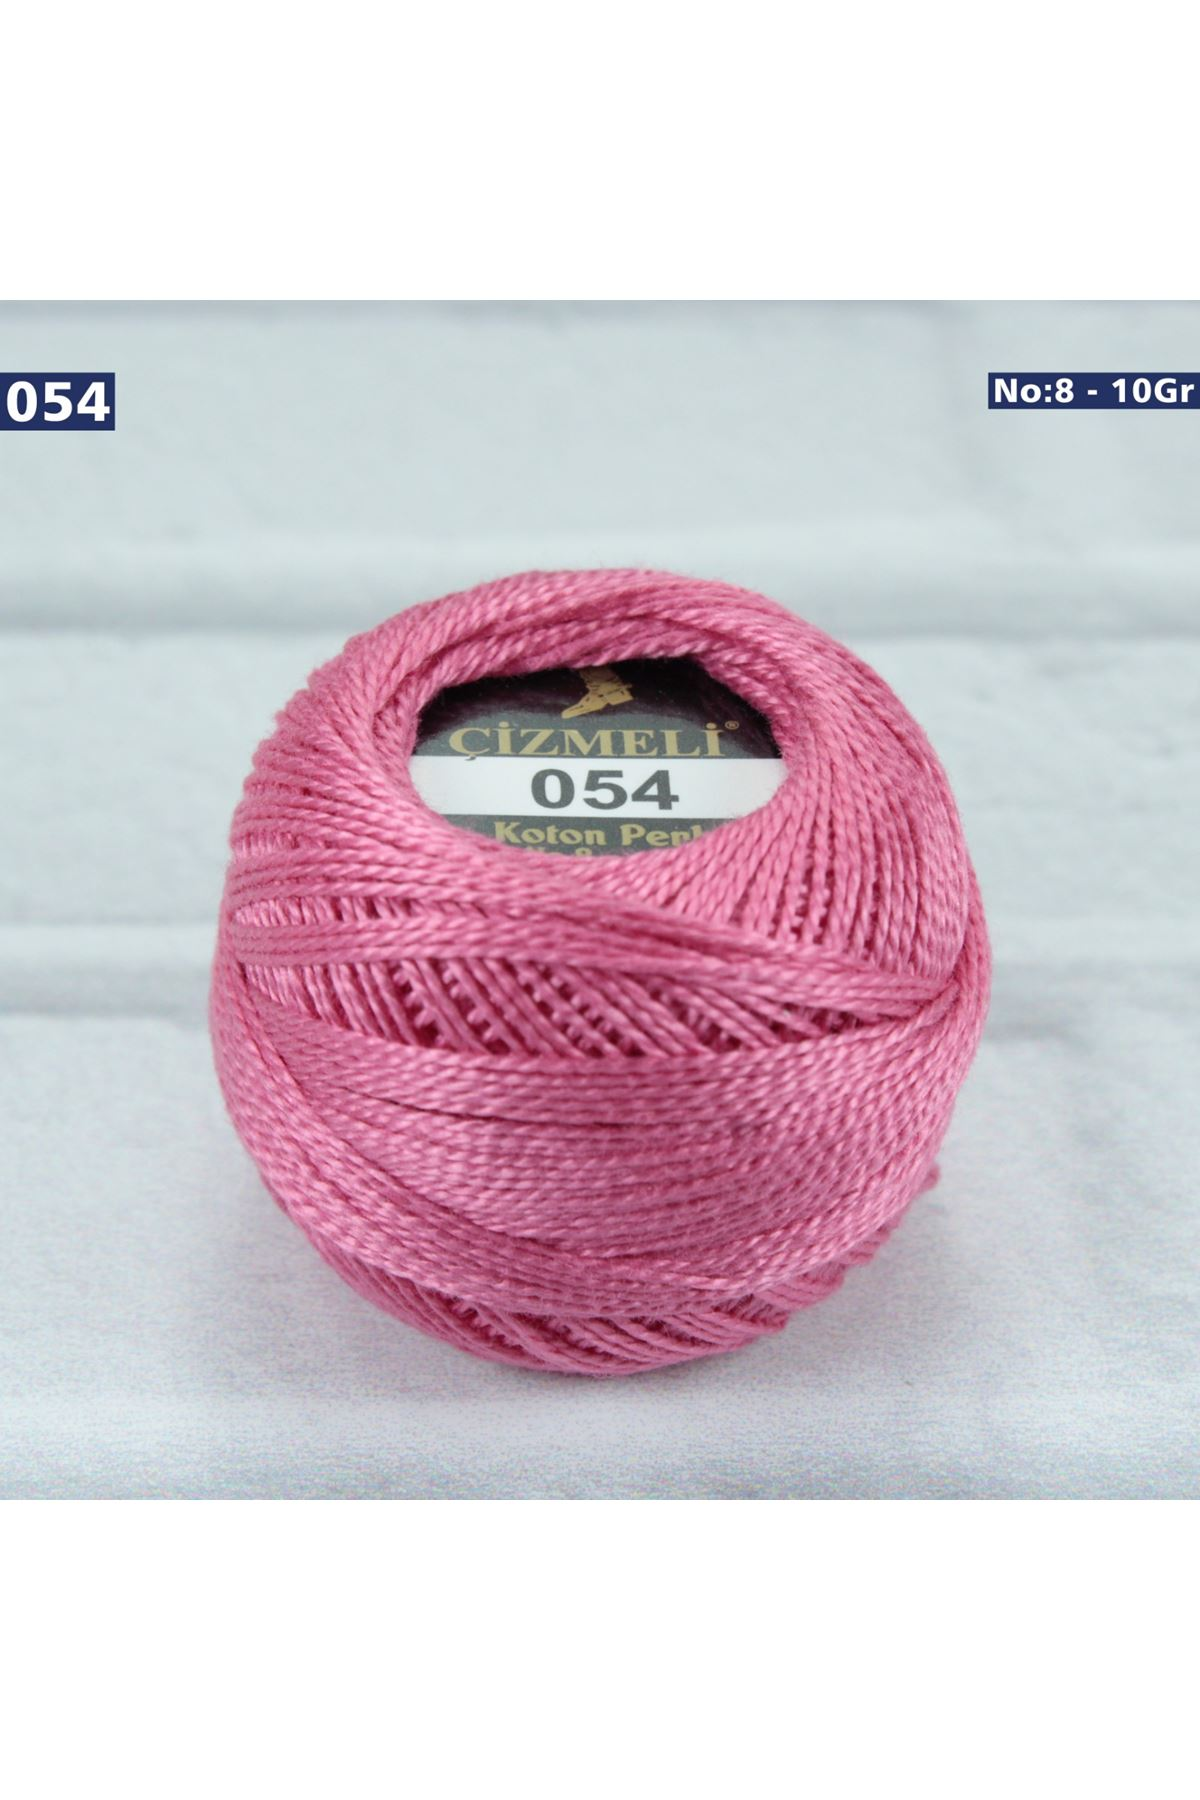 Çizmeli Cotton Perle Nakış İpliği No: 054